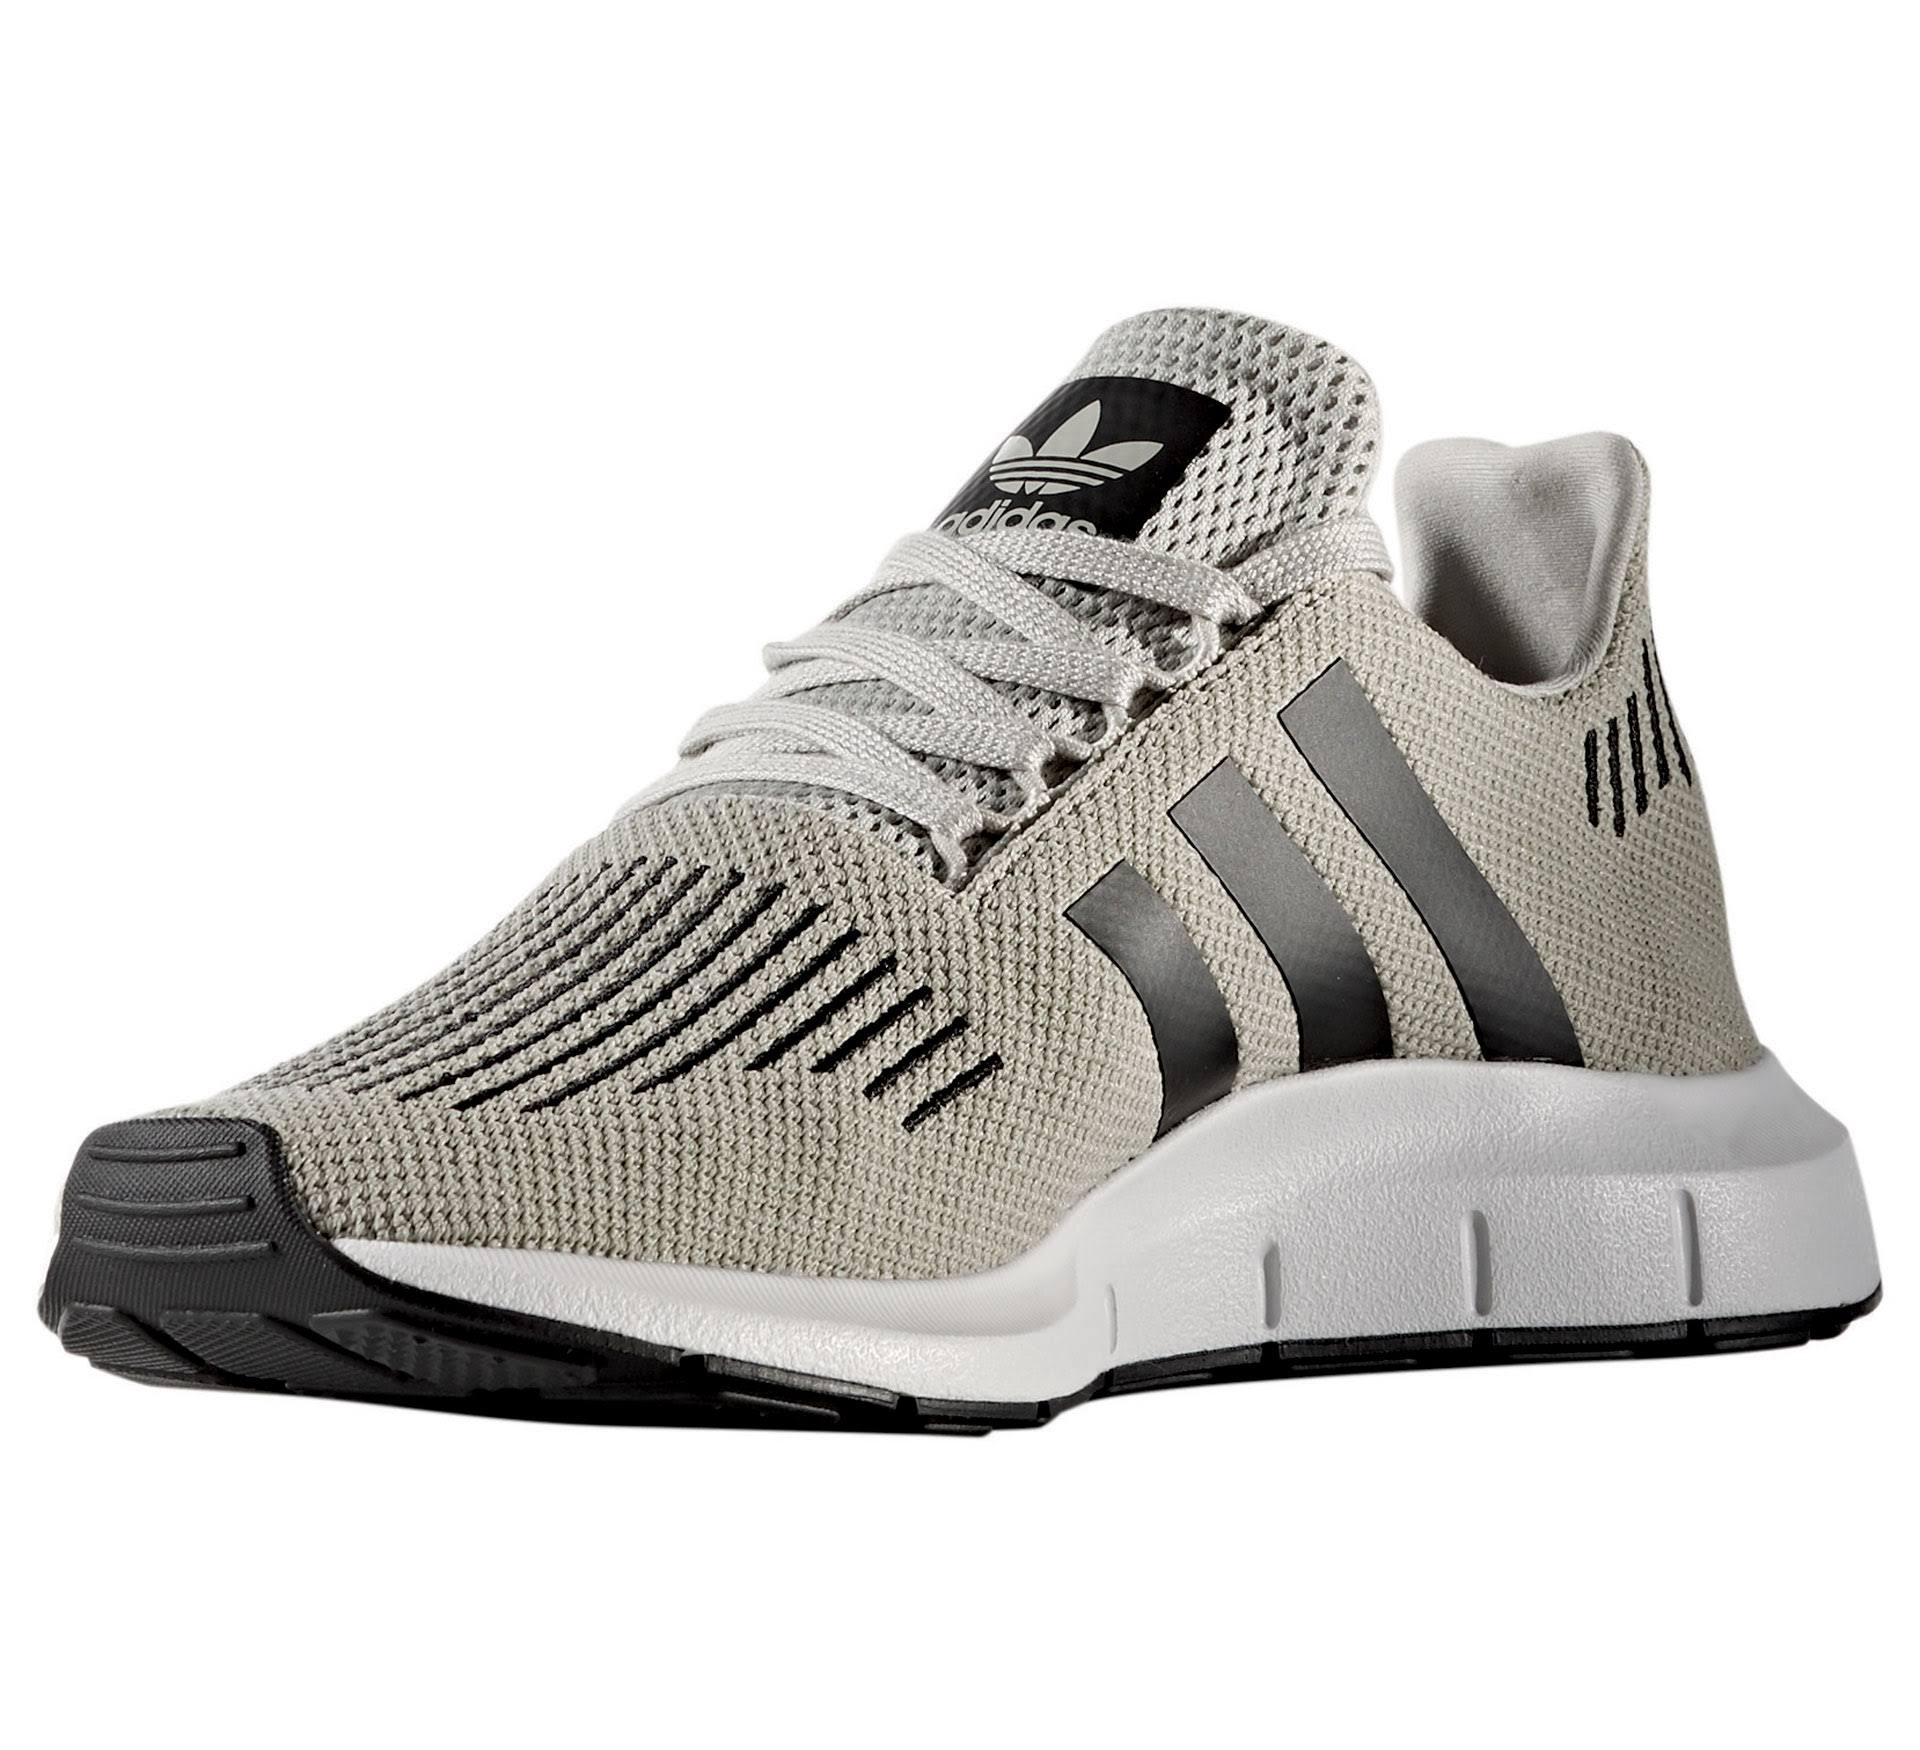 Adidas Mehrfarbig Schwarz Swift Herren Run core sesame Sneaker Schuhe Beige Originals White ftwr Black TTxqwnr